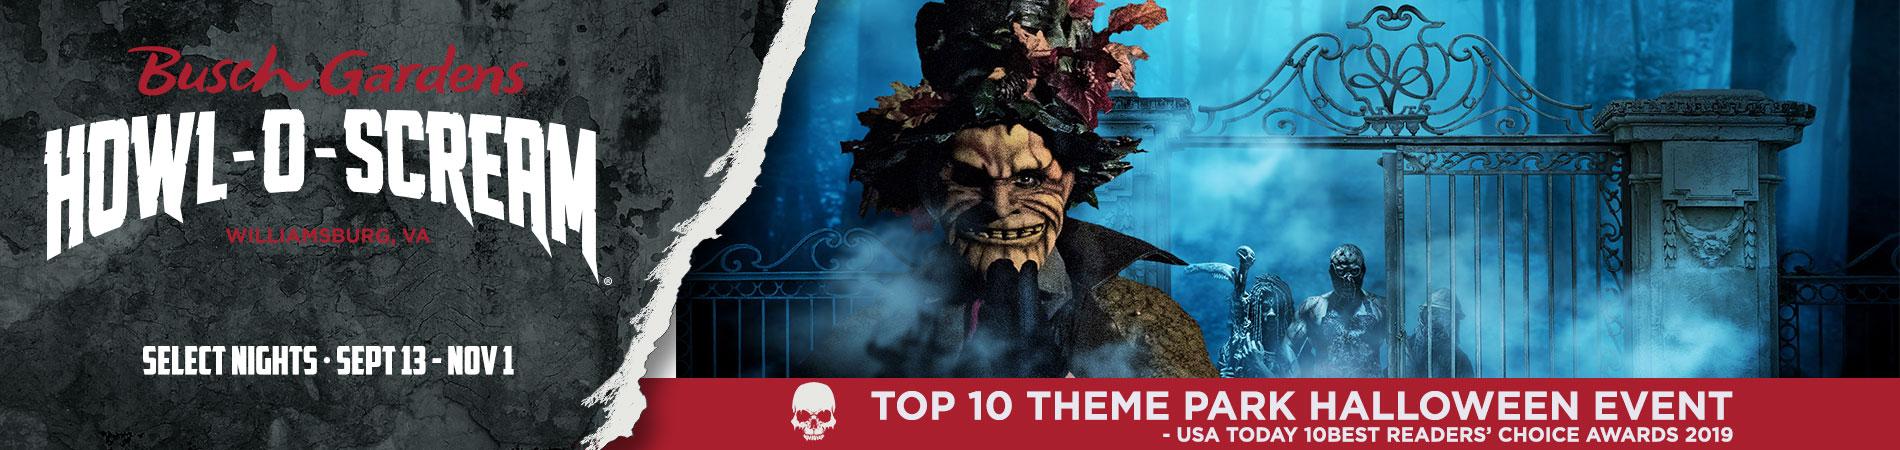 Howl-O-Scream banner textured background